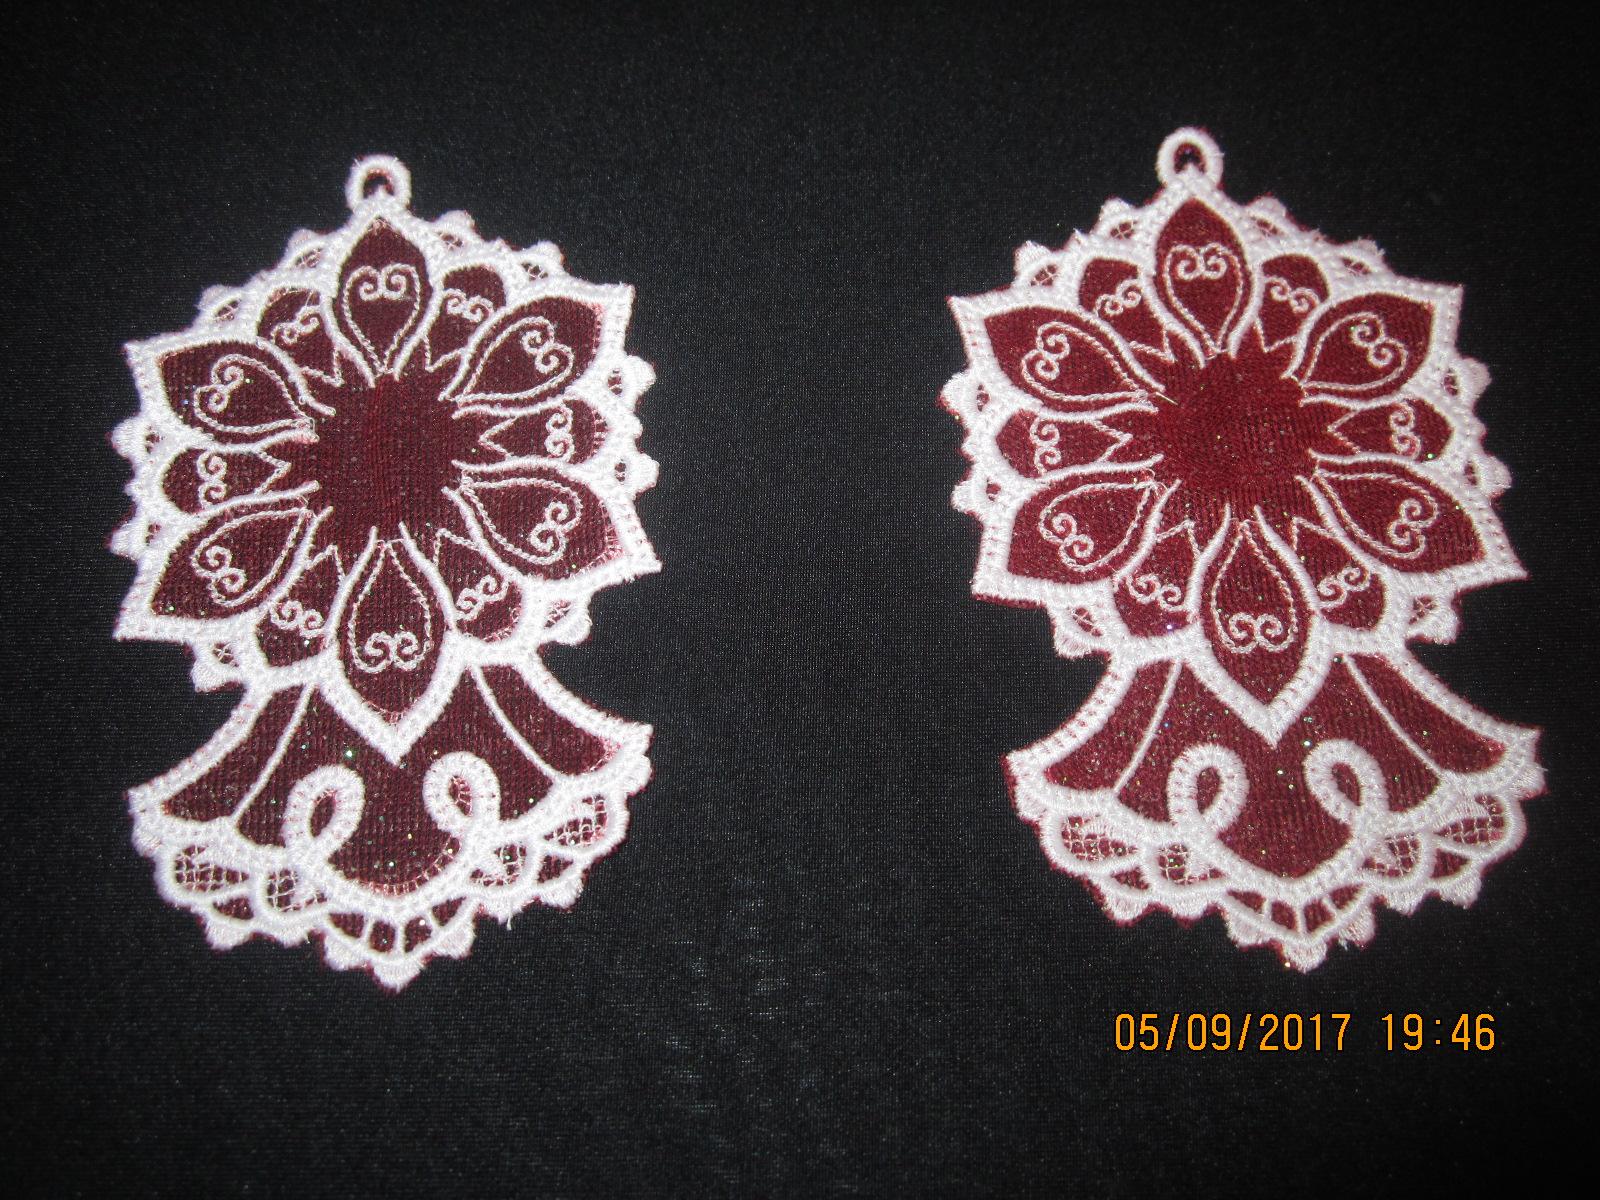 Cute Embroidery Patterns Top 10 Punto Medio Noticias Applique Embroidery Designs Online